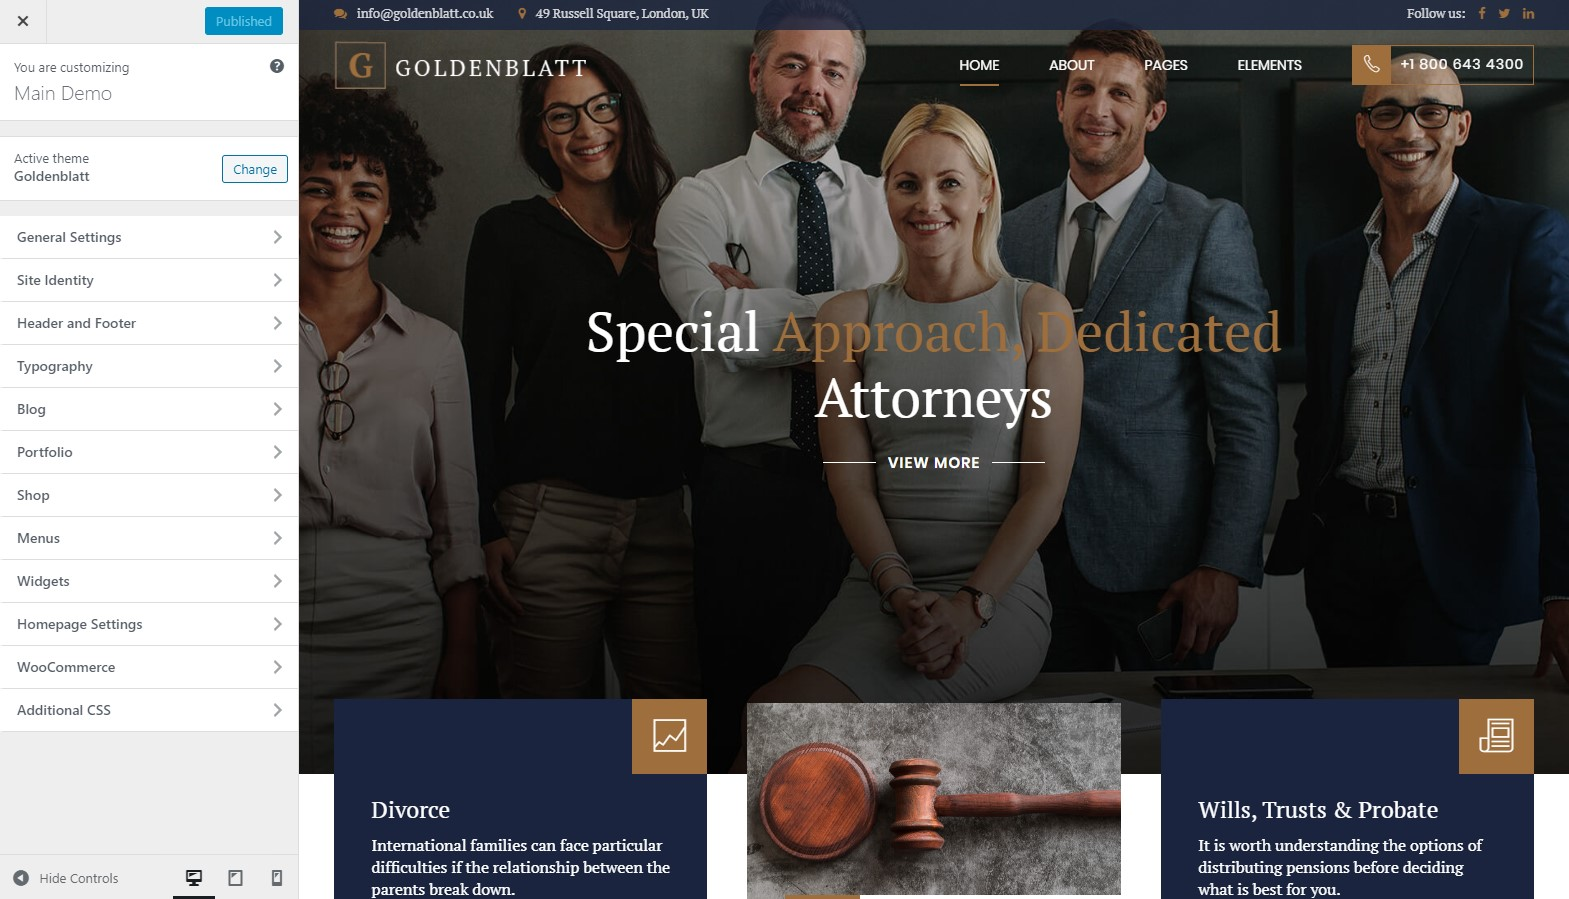 https://documentation.bold-themes.com/goldenblatt/wp-content/uploads/sites/51/2019/11/customize.jpg